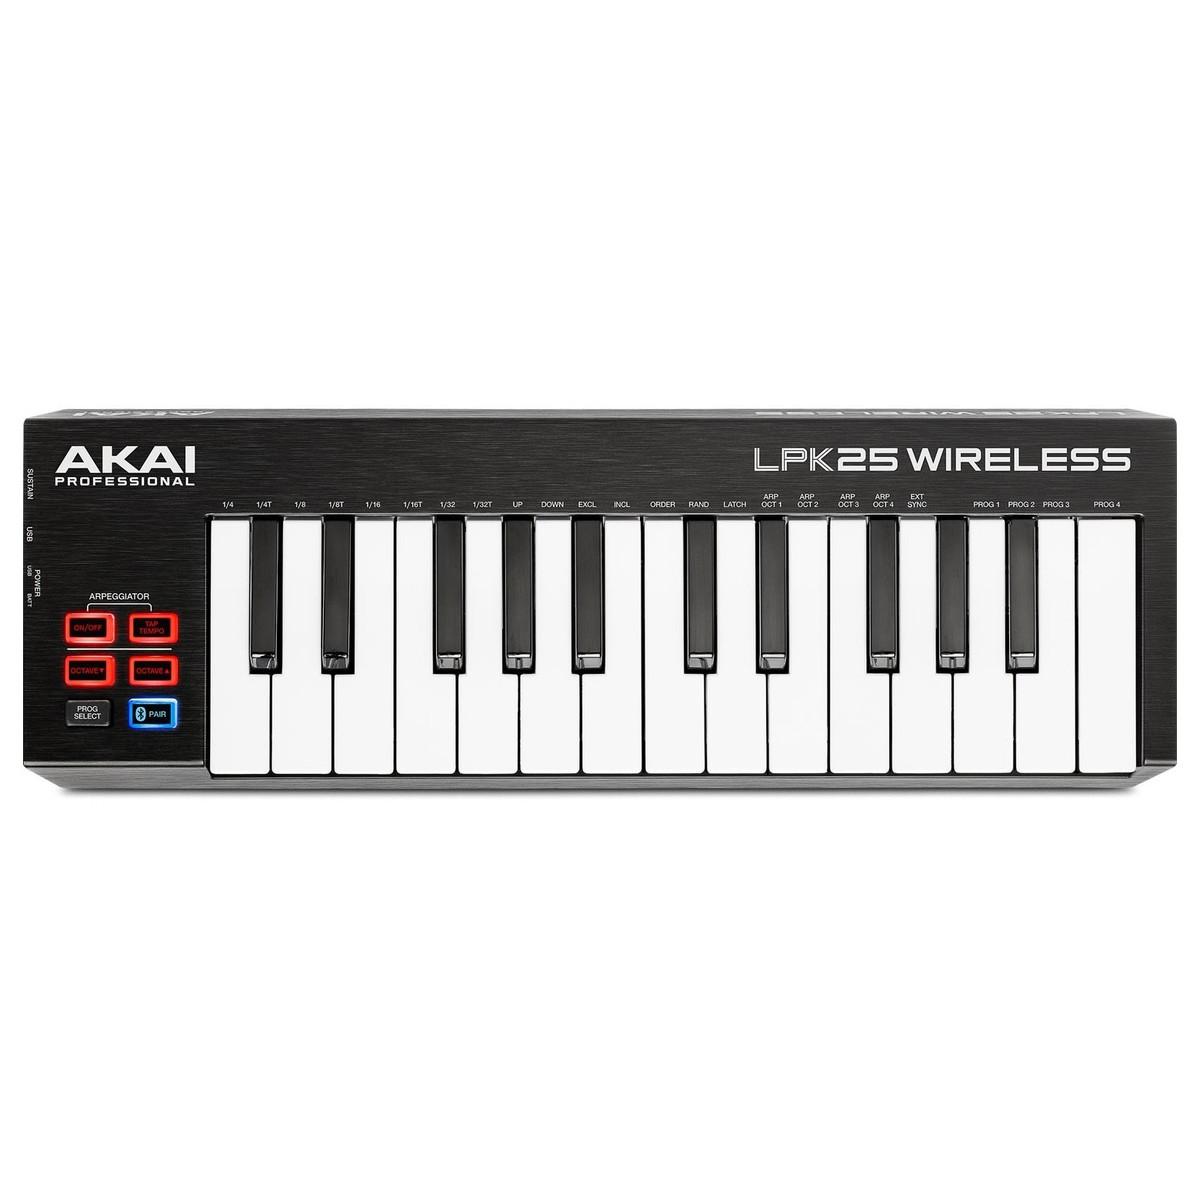 akai lpk25 wireless midi controller at gear4music com rh gear4music es Akai LPK25 Reason Akai LPK25 Tutorial